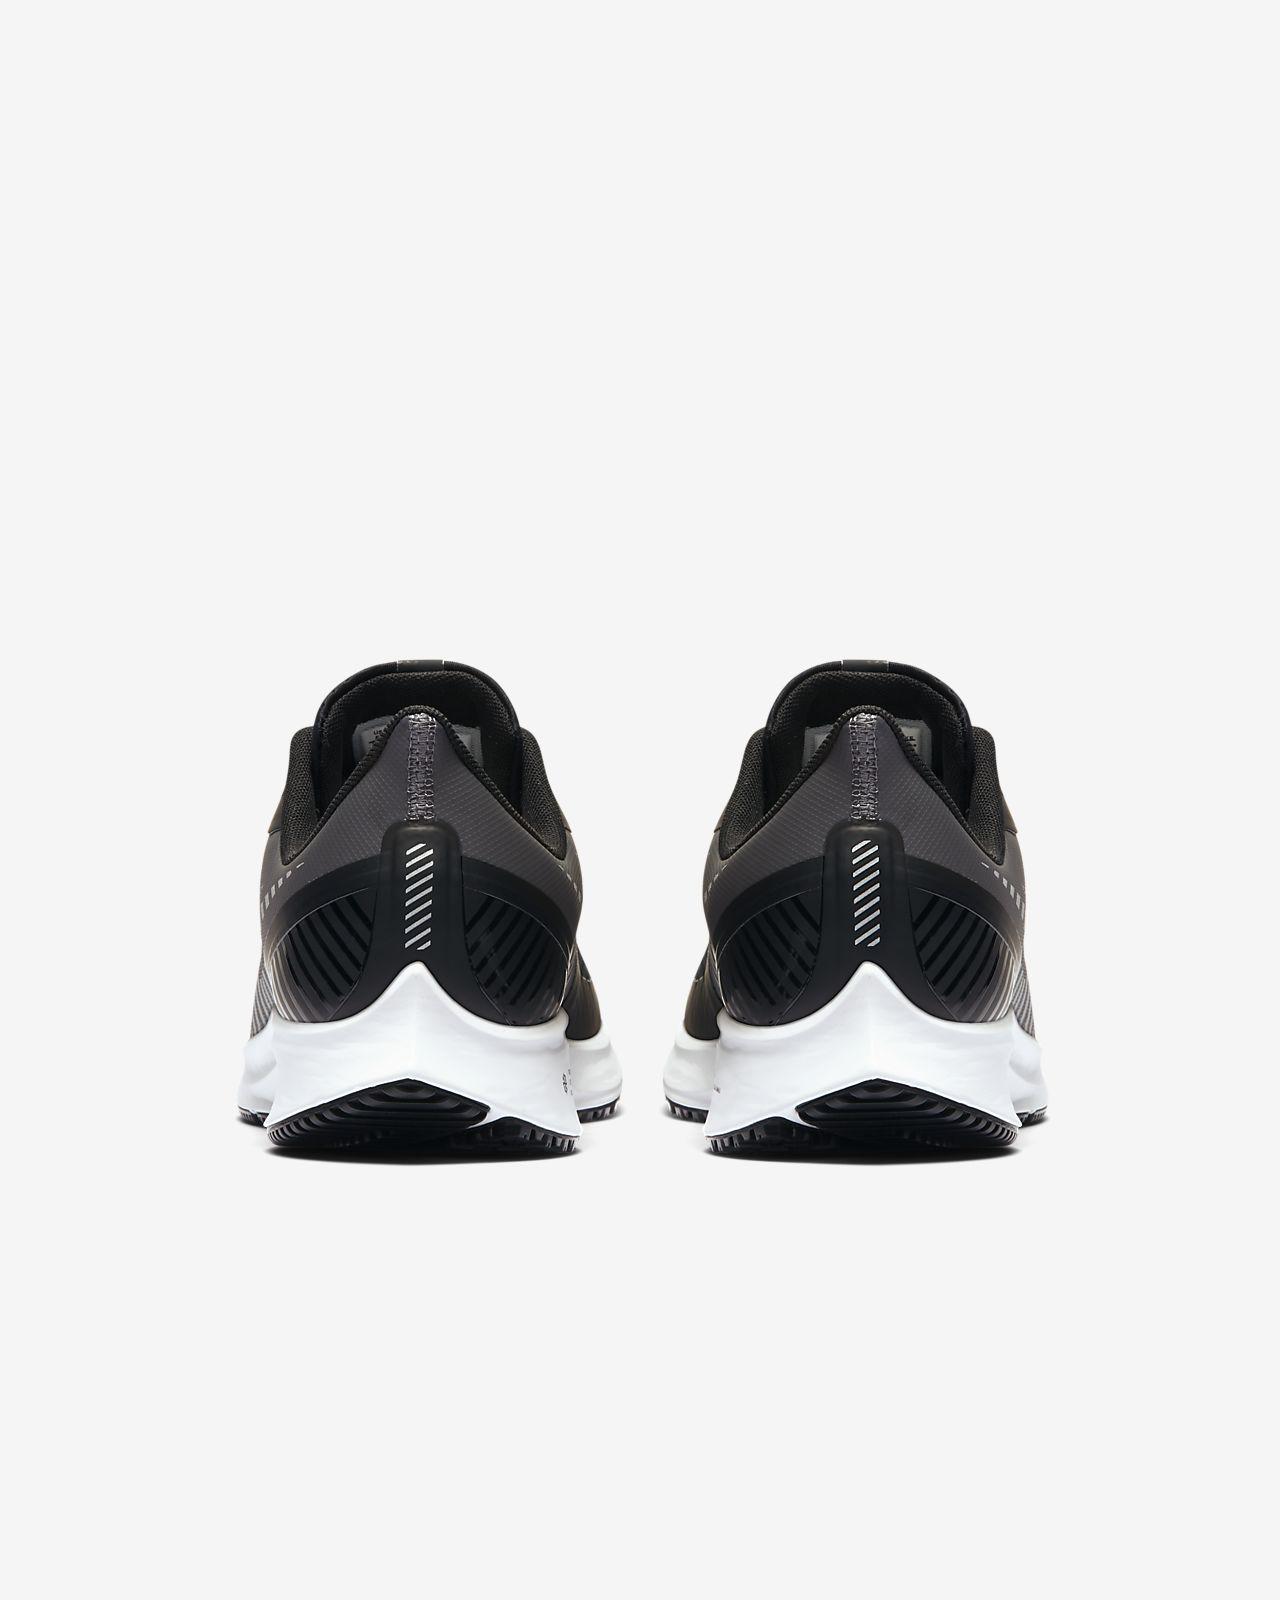 Shop Nike Air Max 90 Gradeschool Kid's Shoes 5.5 m Free